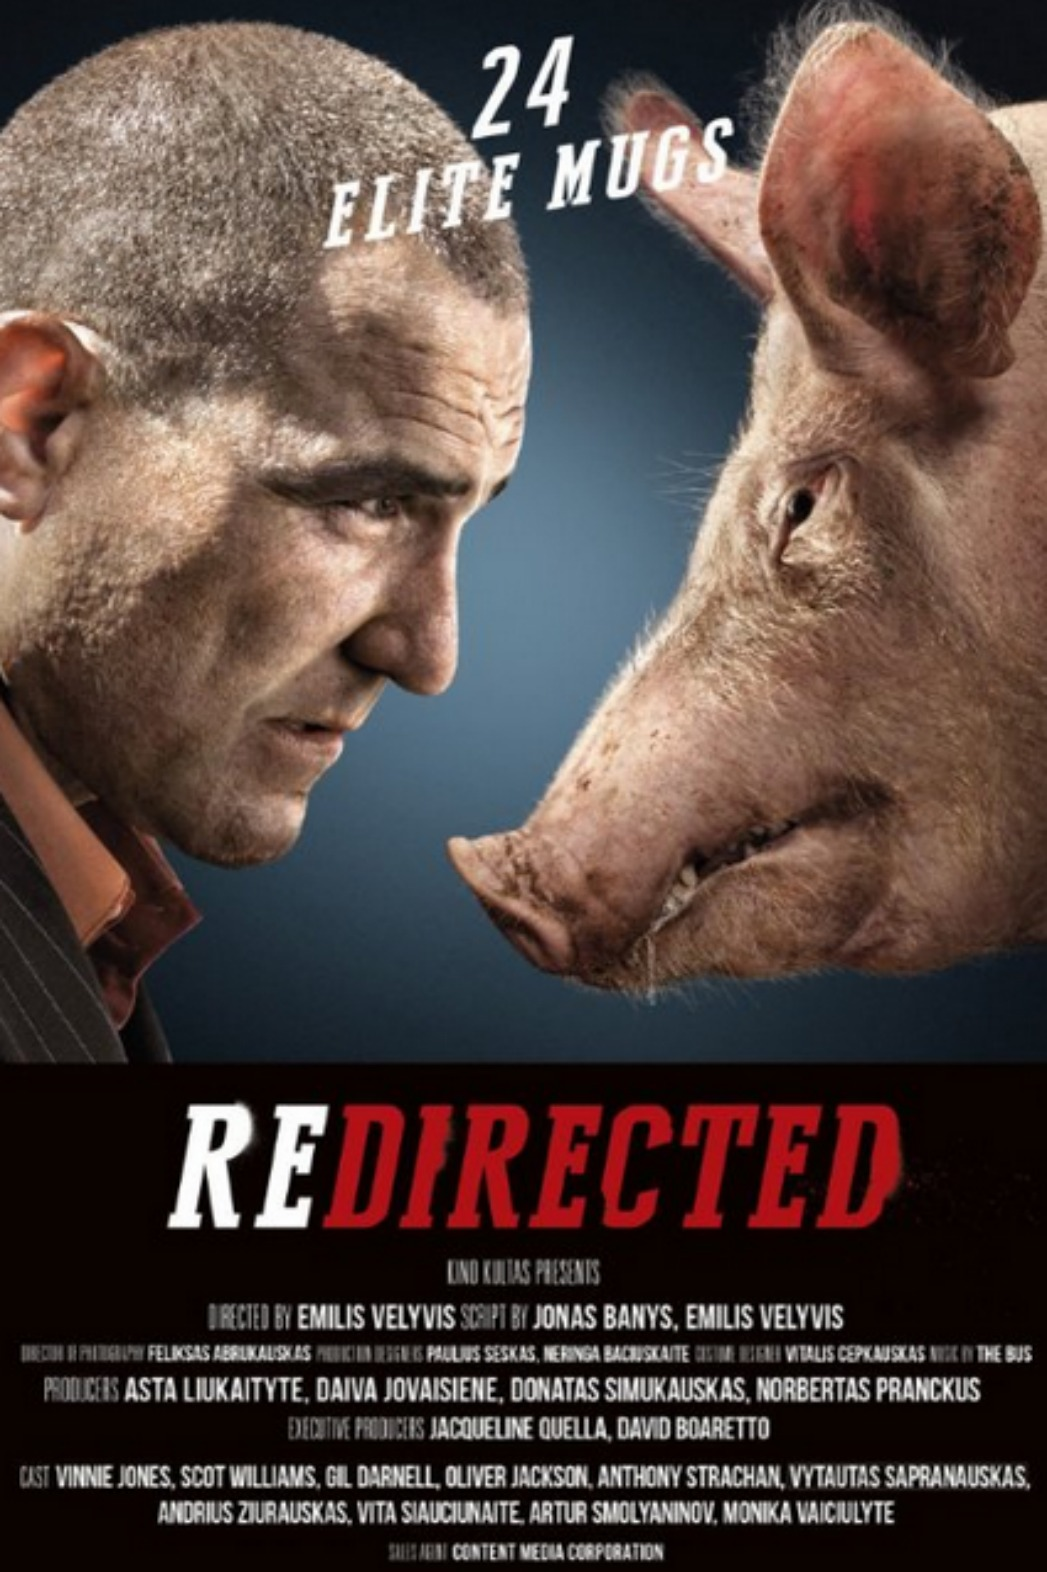 Redirected - P - 2014